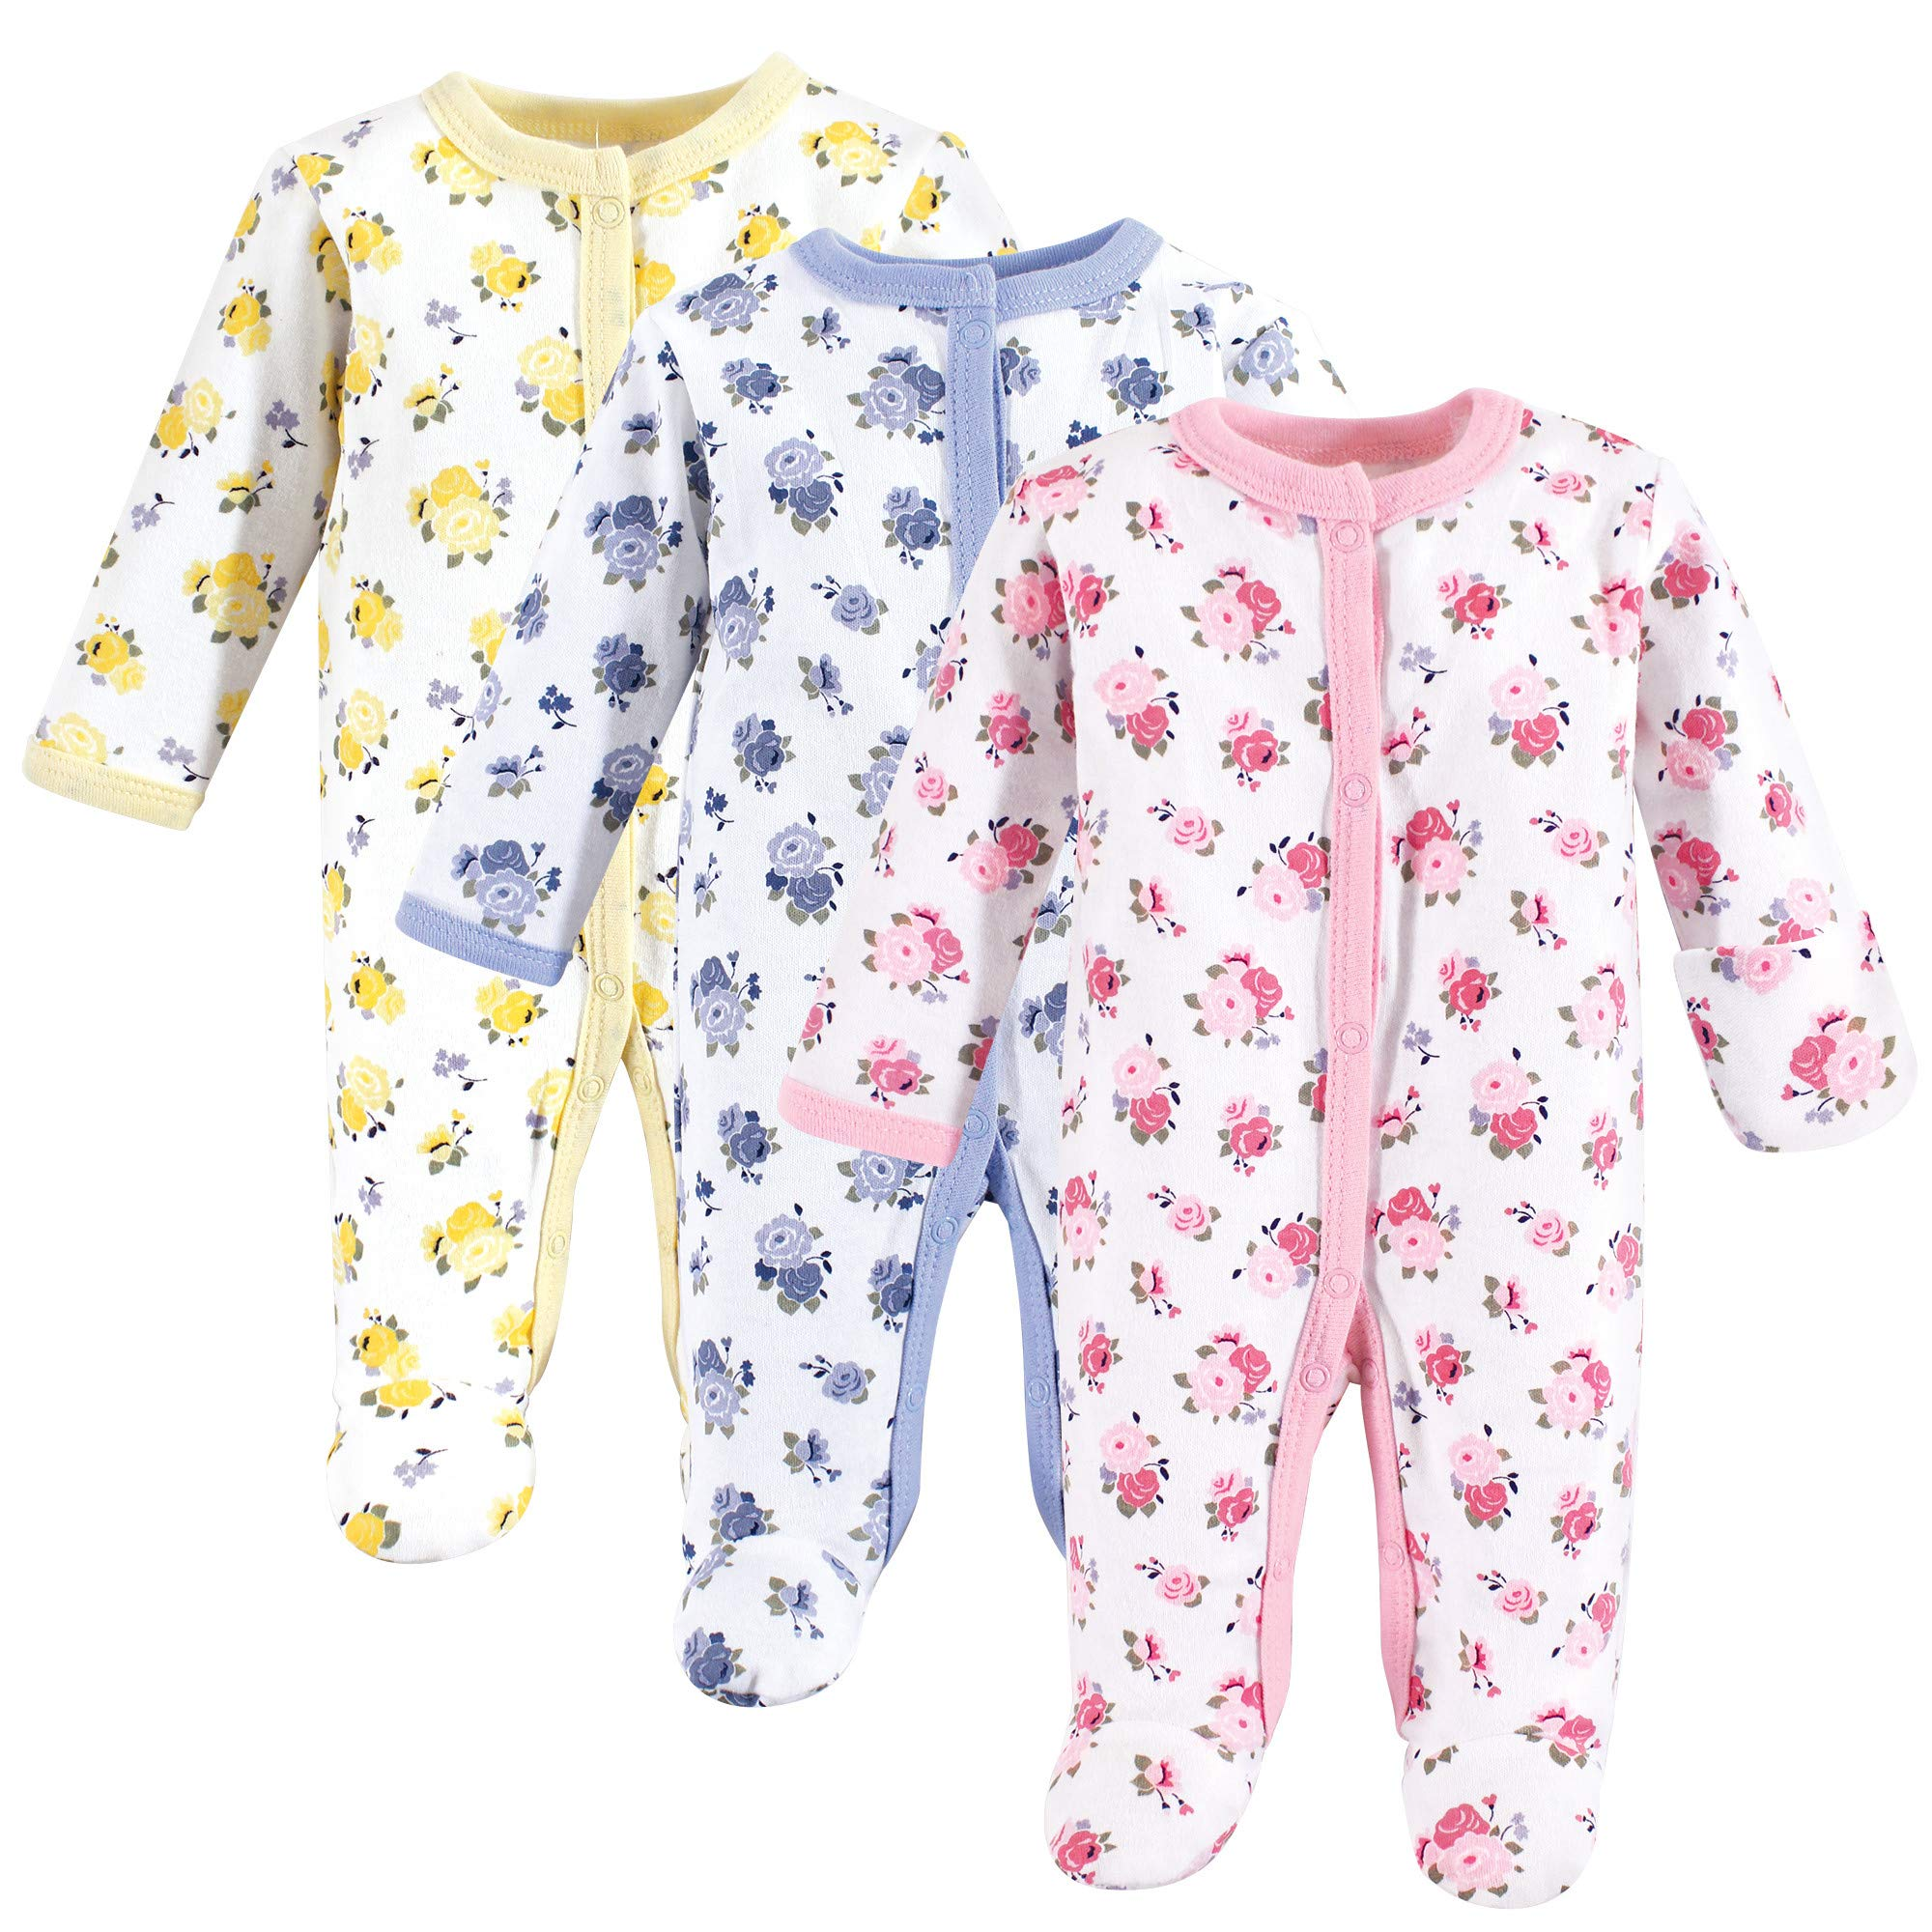 Luvable Friends Baby Preemie Sleep and Play, 3 Pack